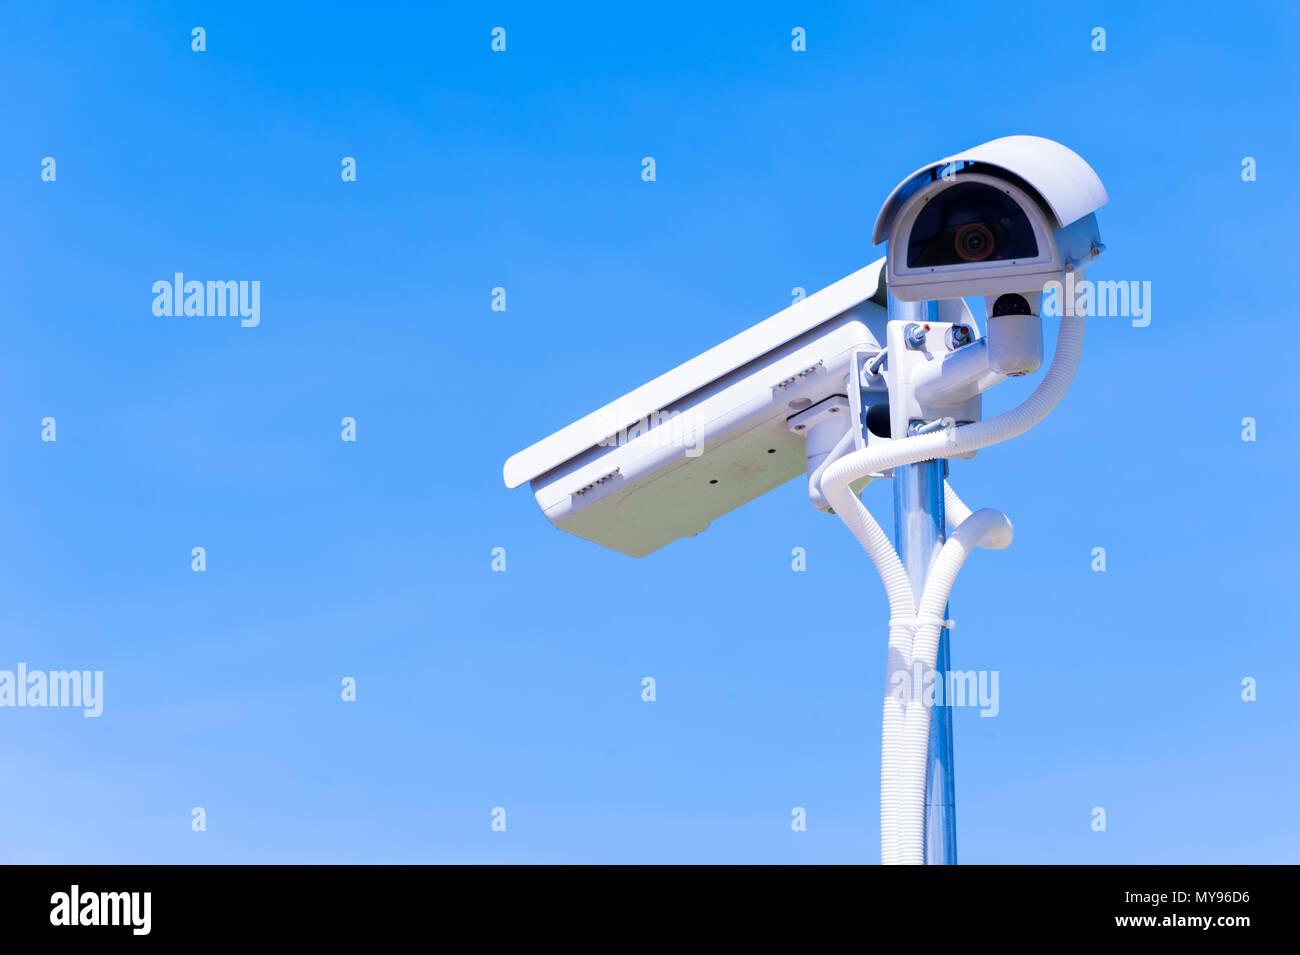 CCTV camera or surveillance operaiting on blue sky - Stock Image